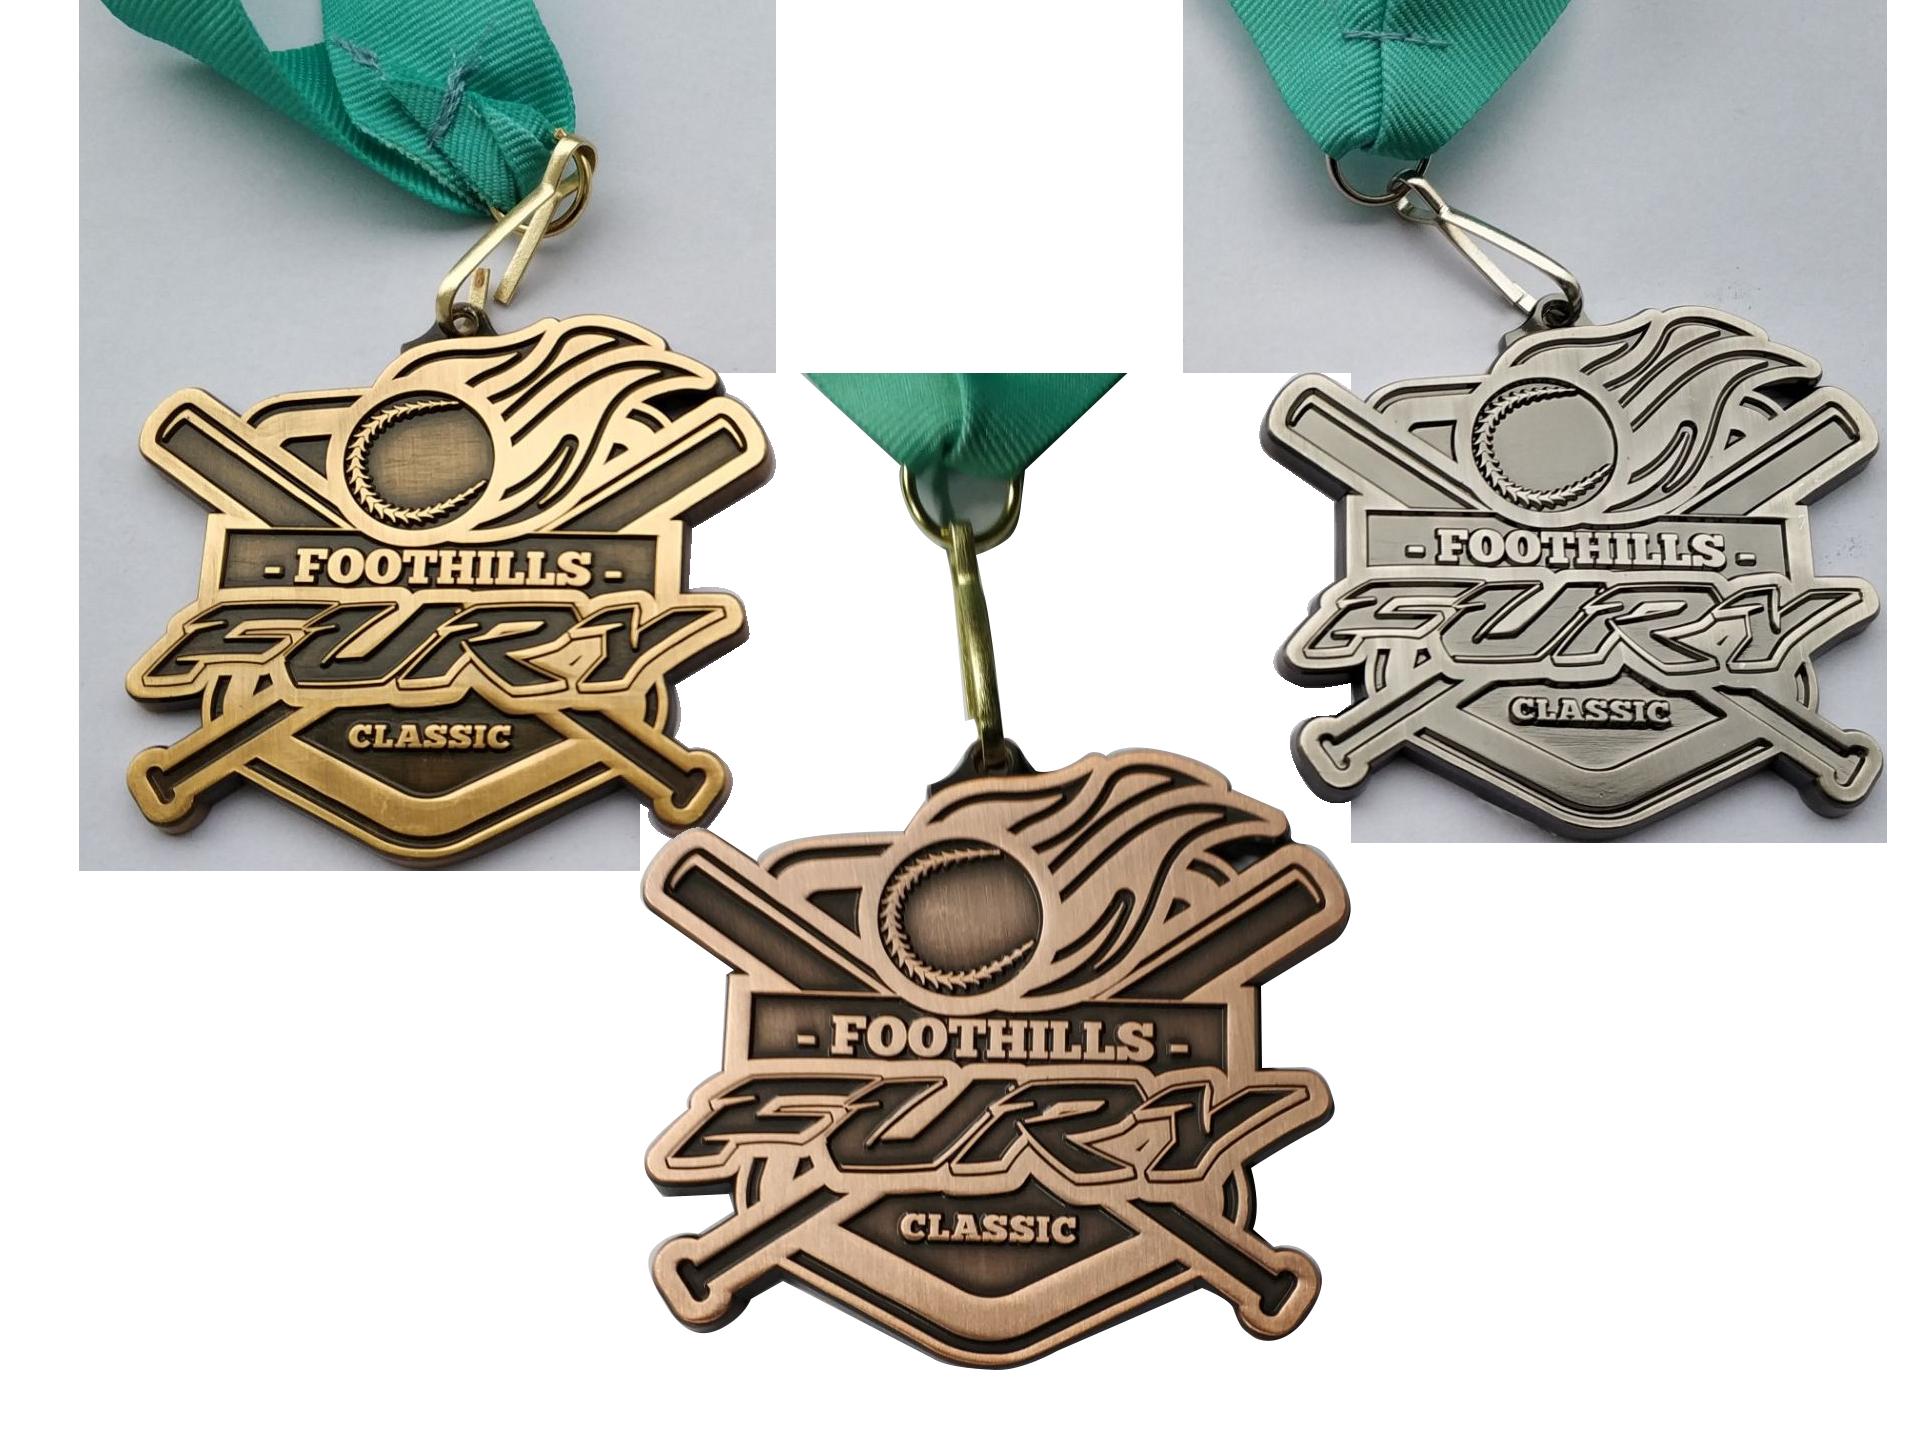 foot-hills-fury-baseball-medals